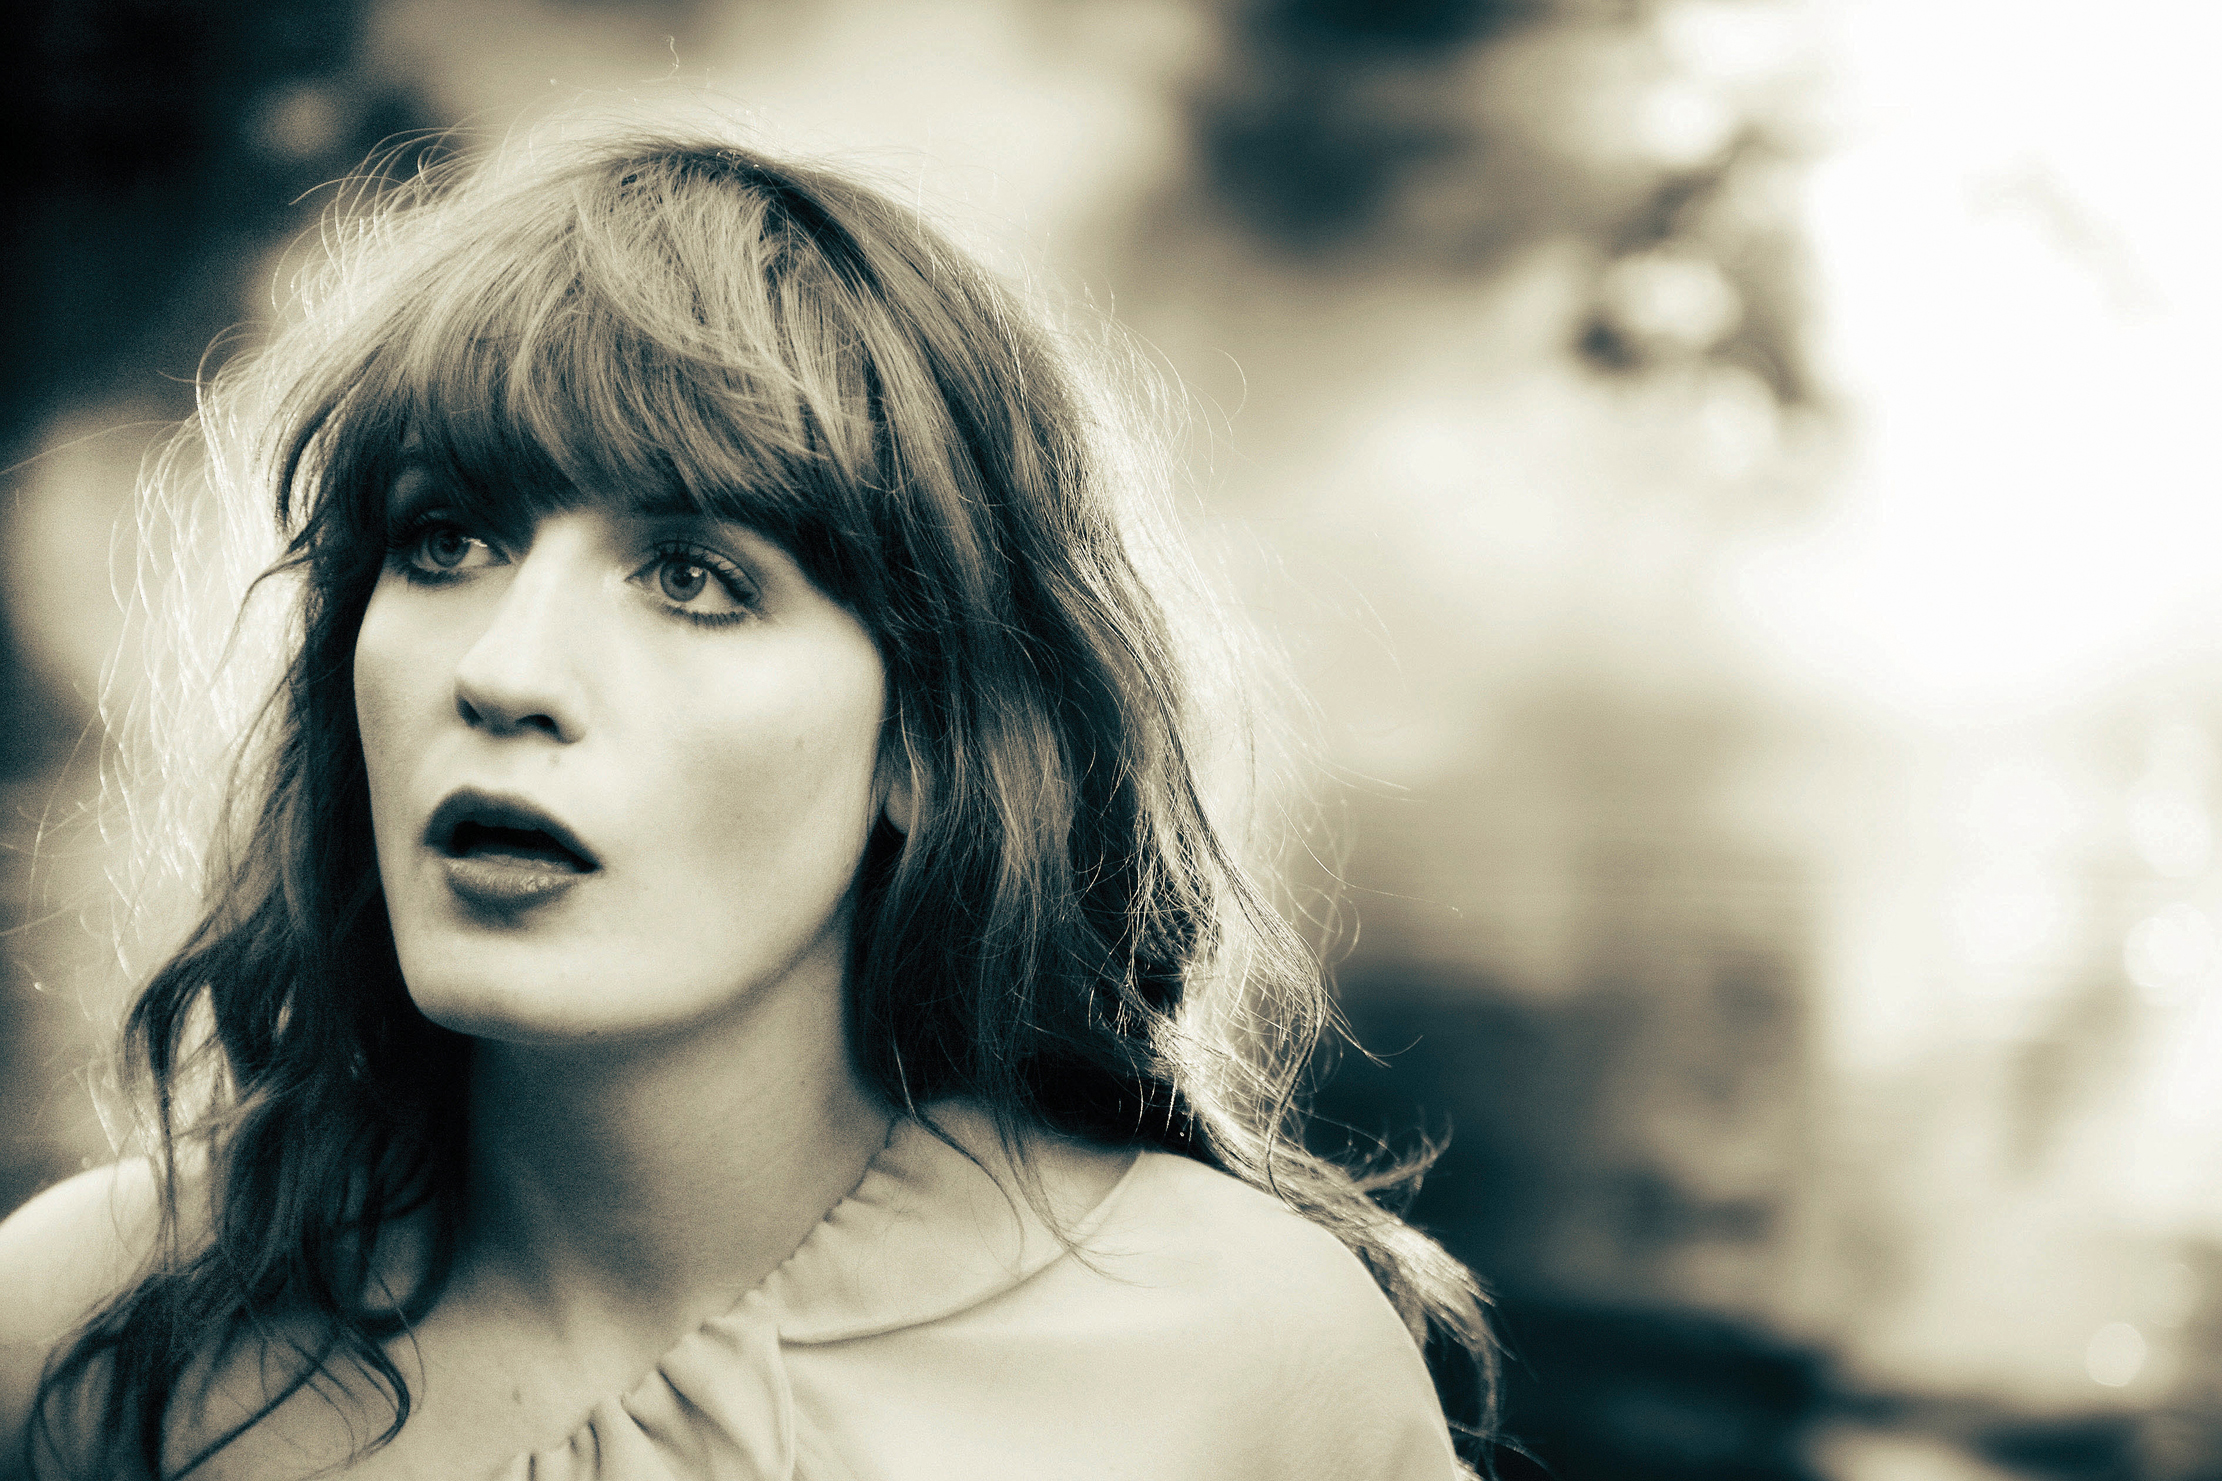 women singer open mouth